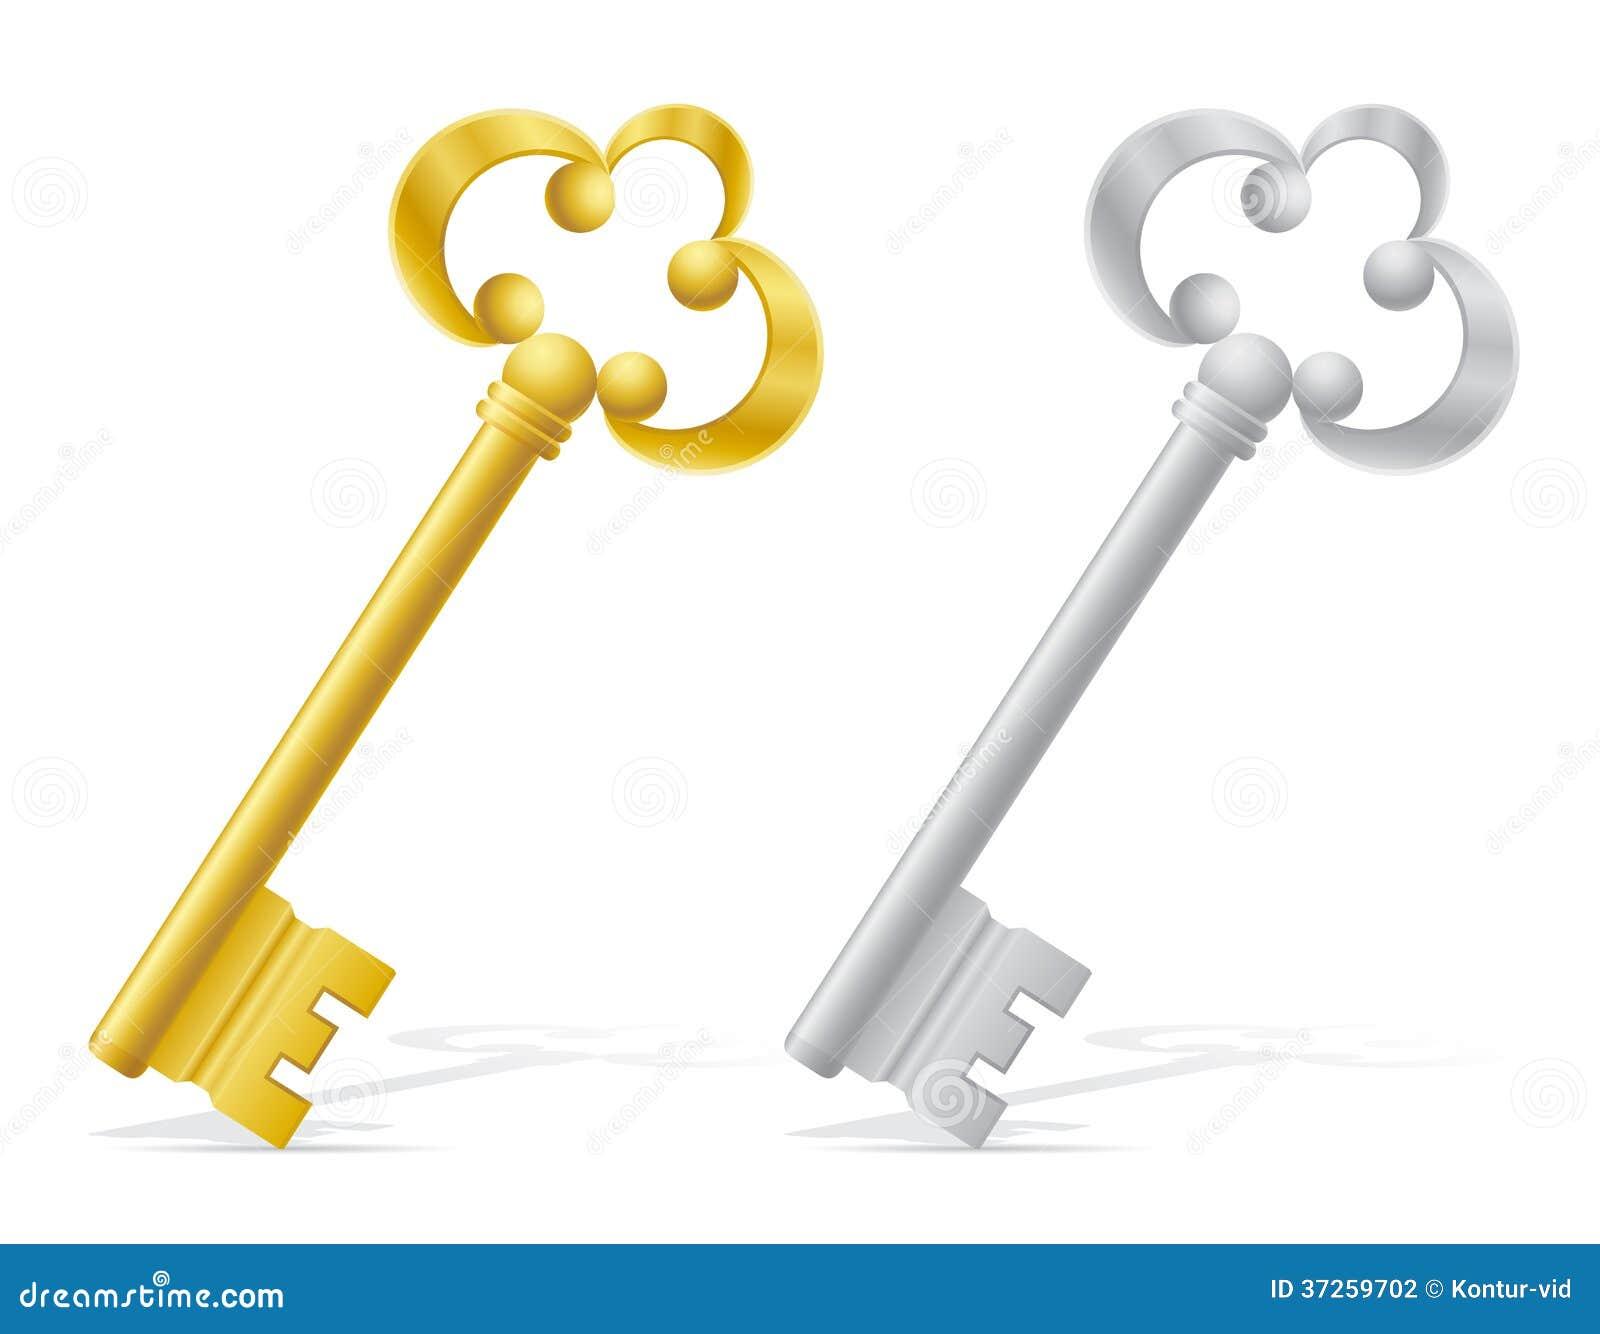 Le serrures gorges et son crochetage - Lockpickingfrance. org